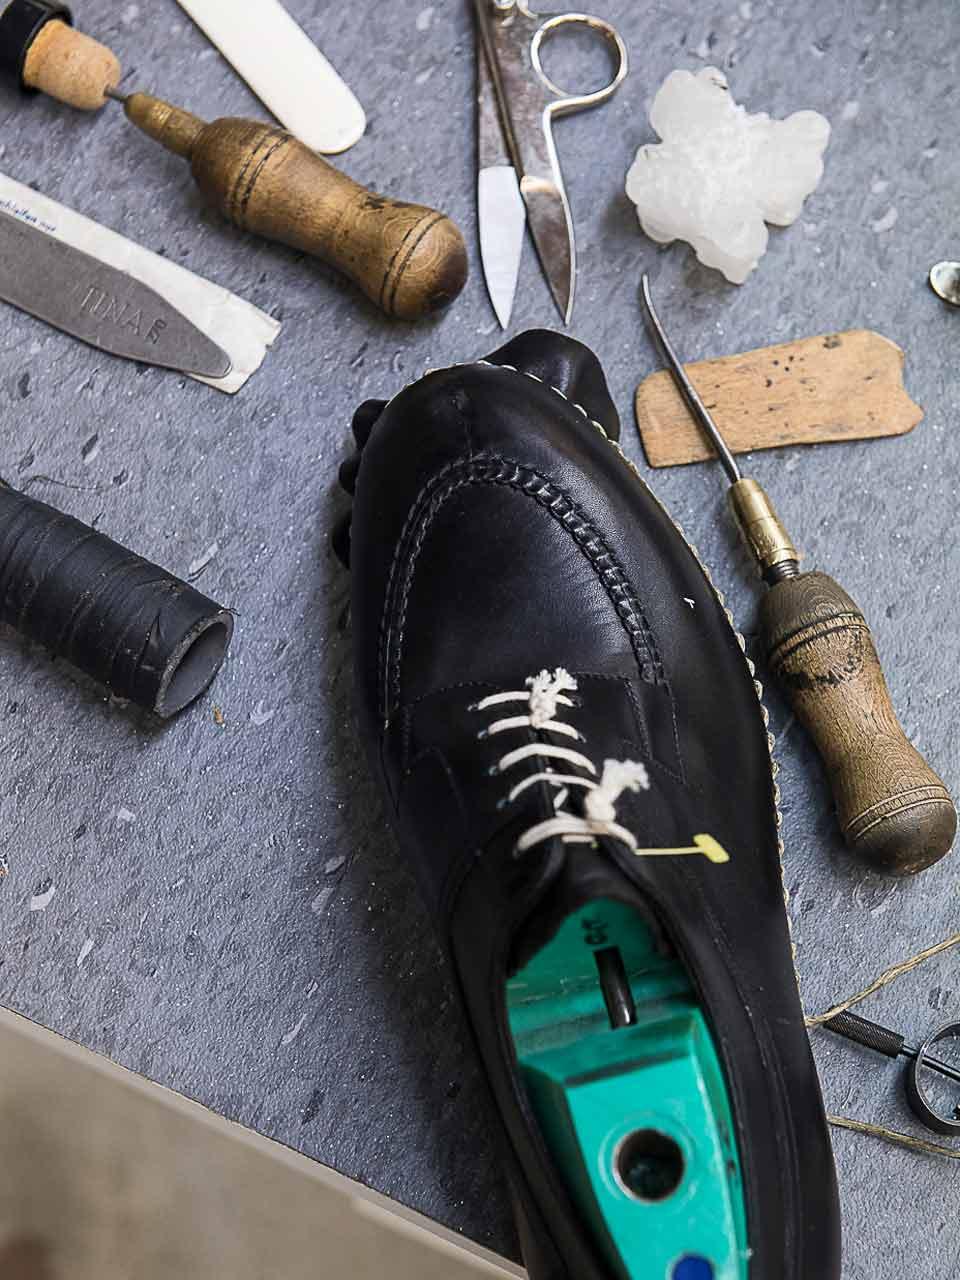 manufacture weston reparation